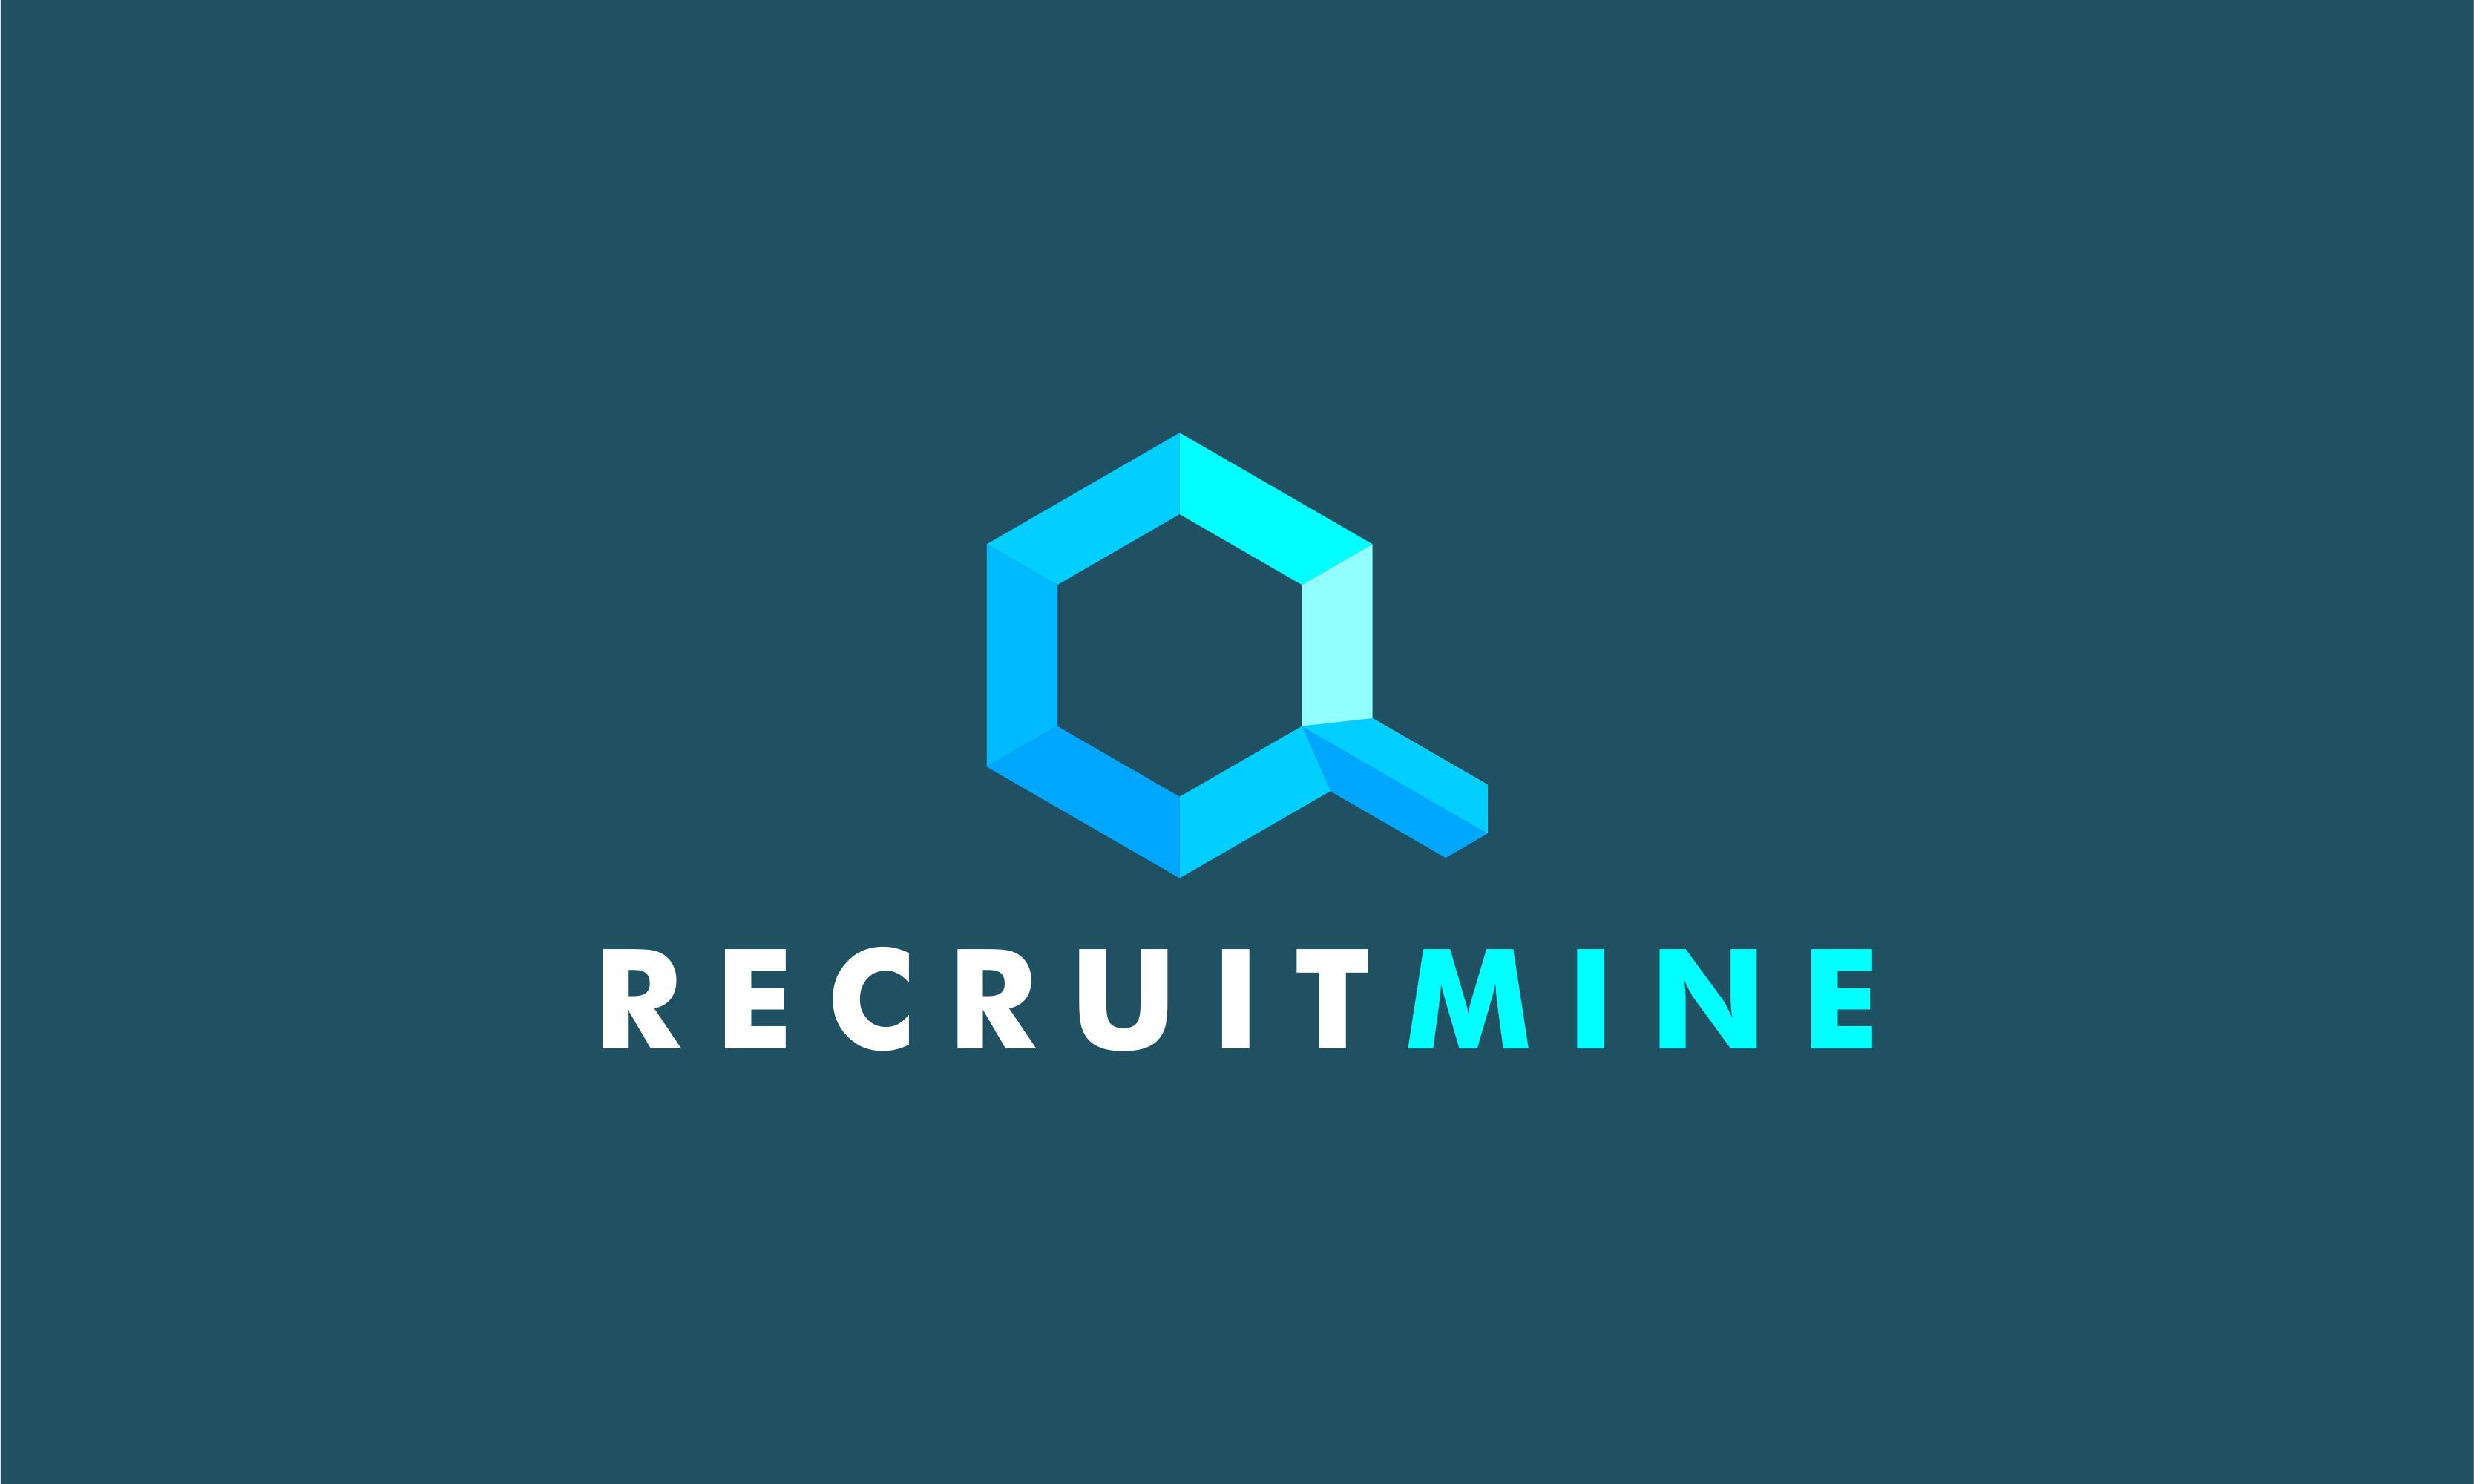 RecruitMine